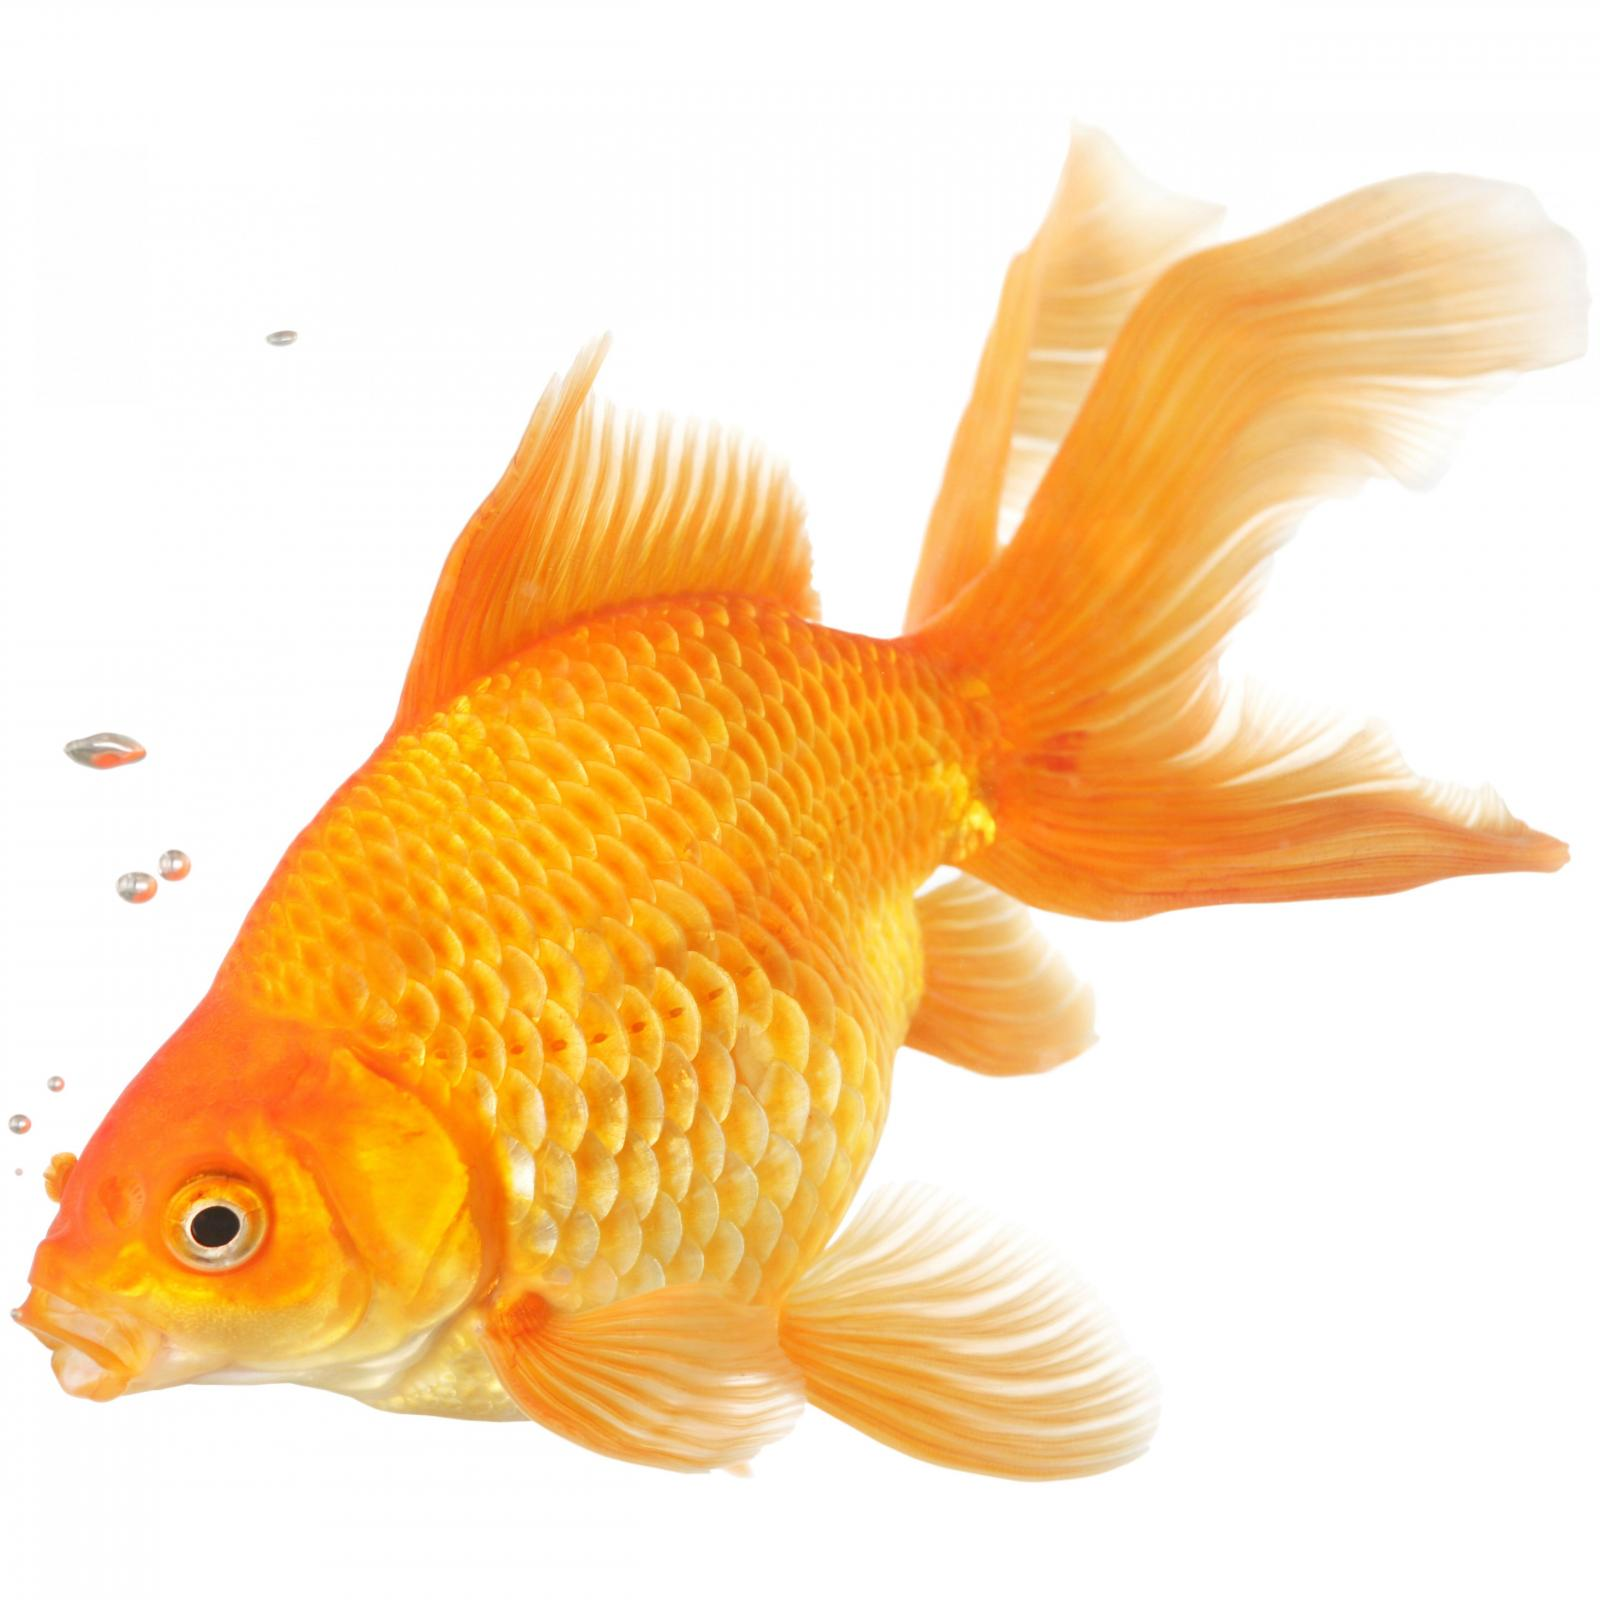 Goldfish Characteristics Habitats Types And More